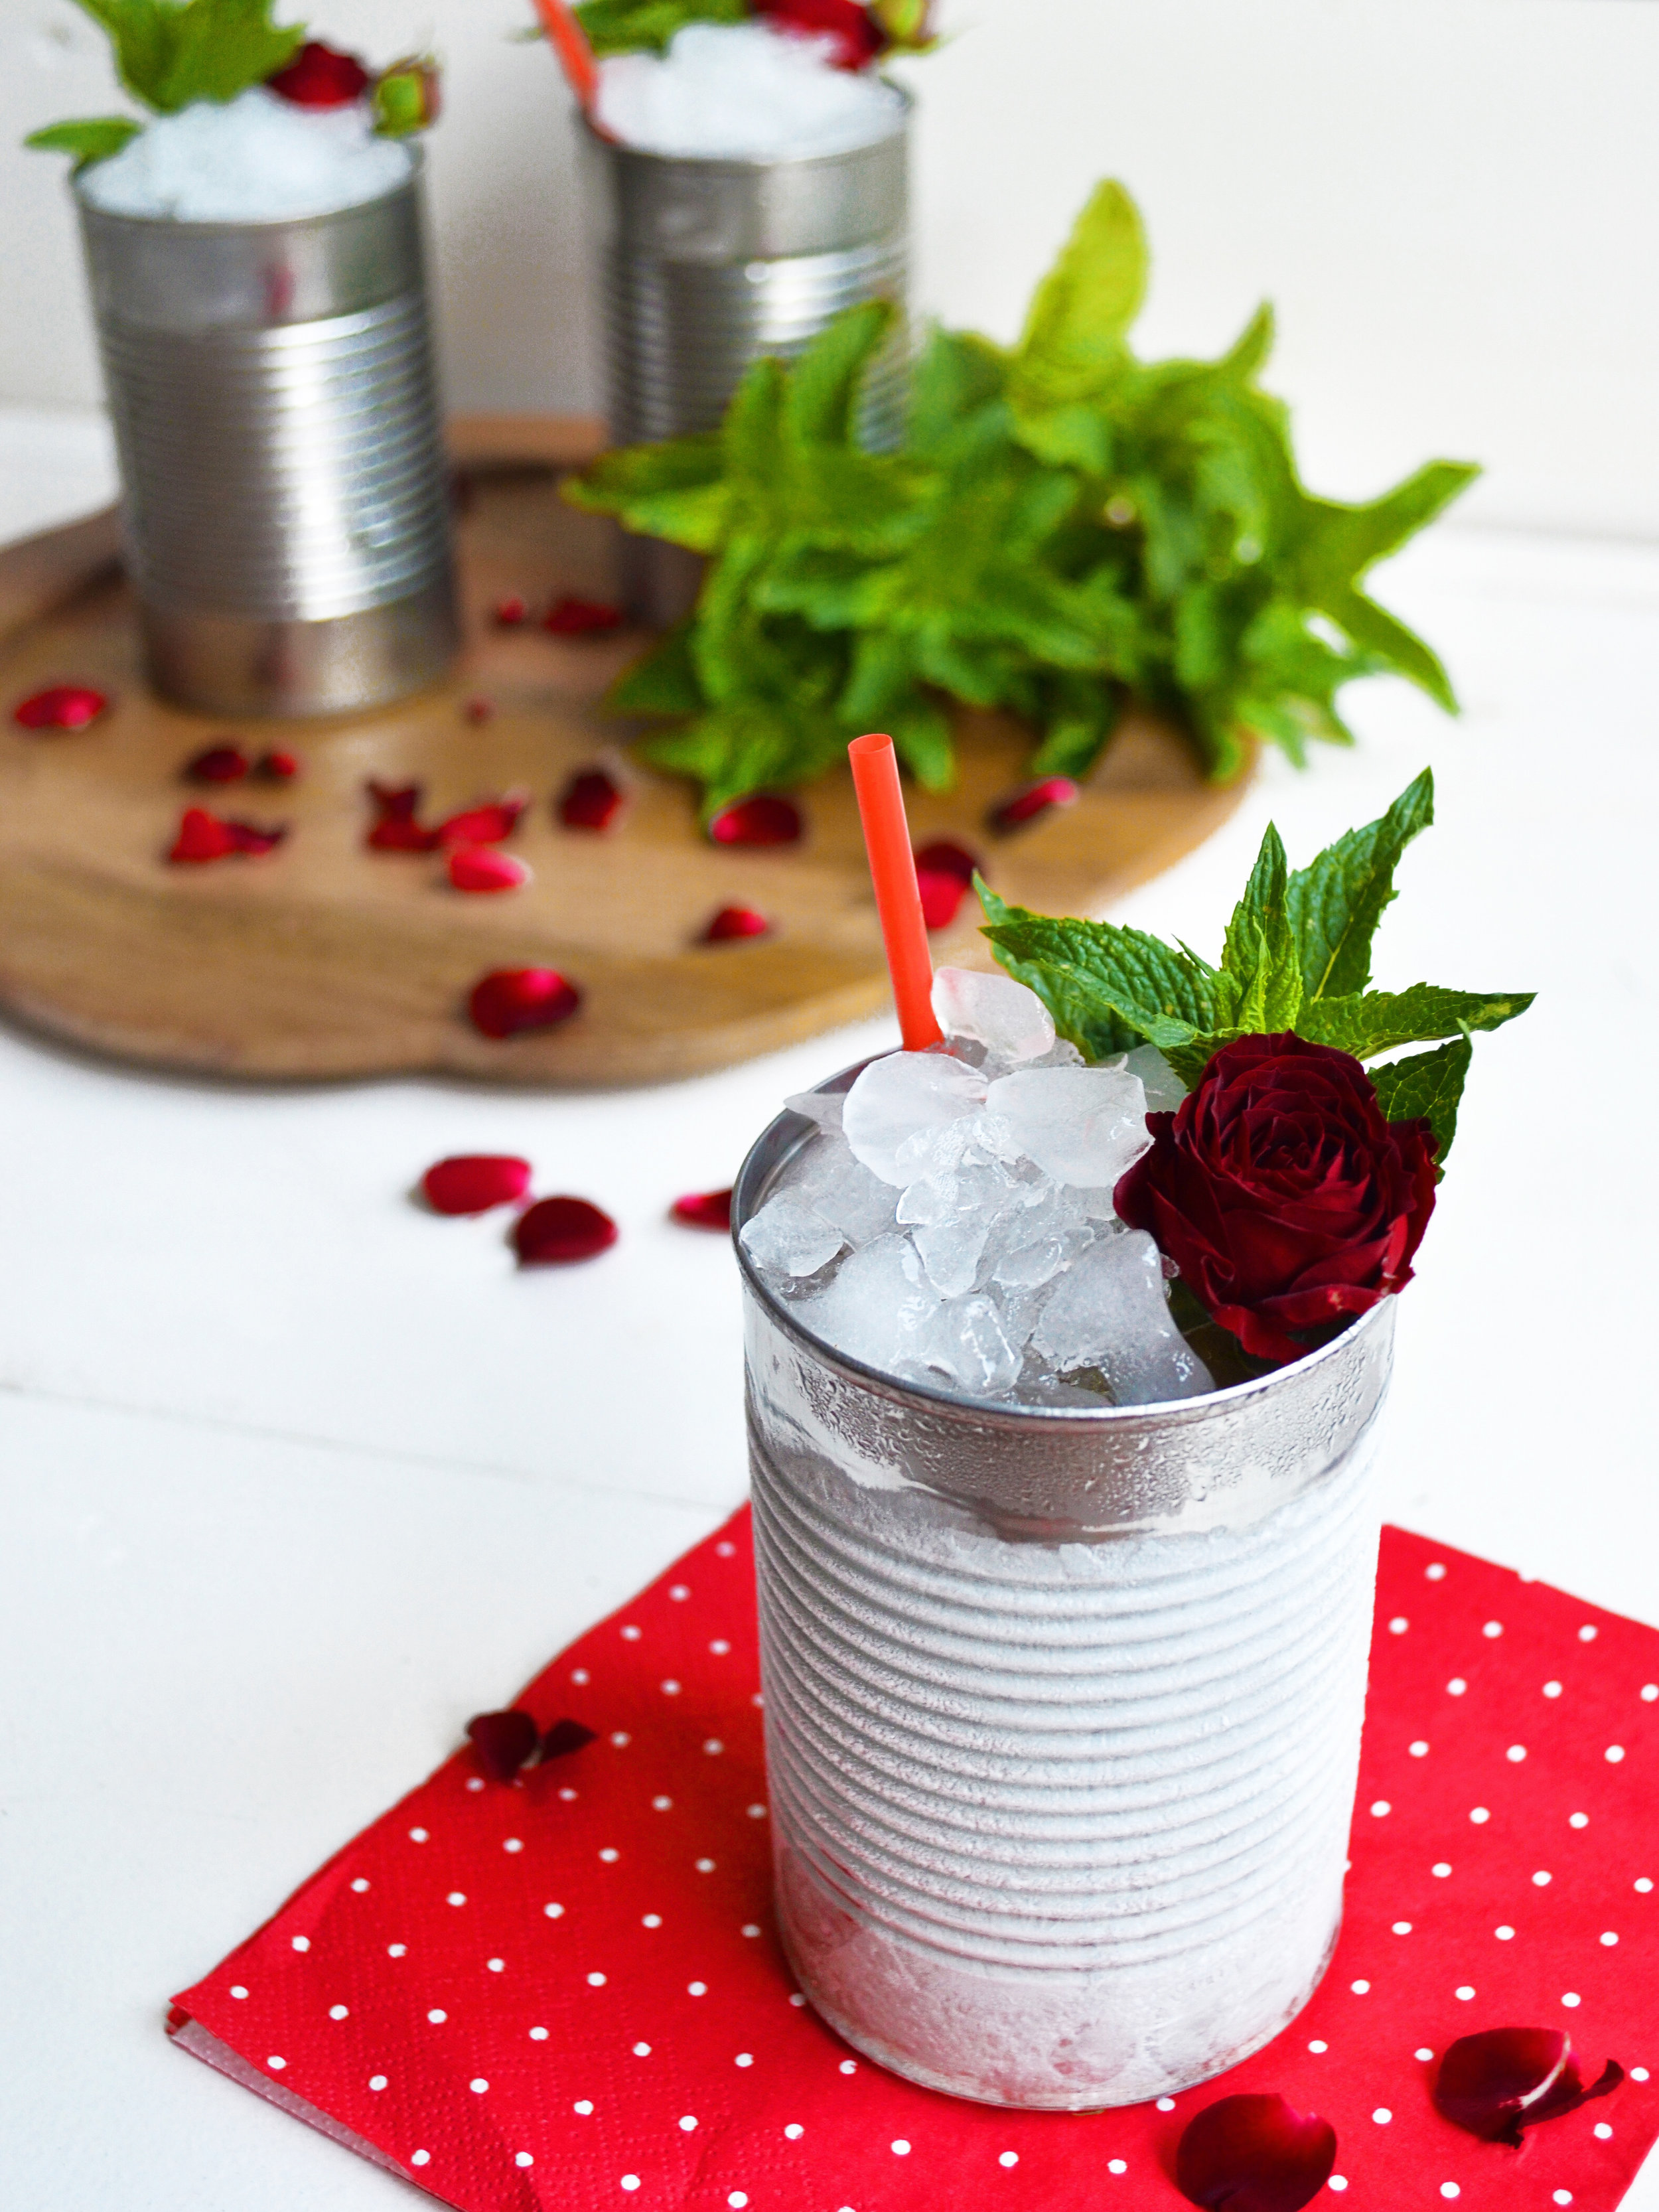 Mint Rose Petal Julep | drinkingwithchickens.com